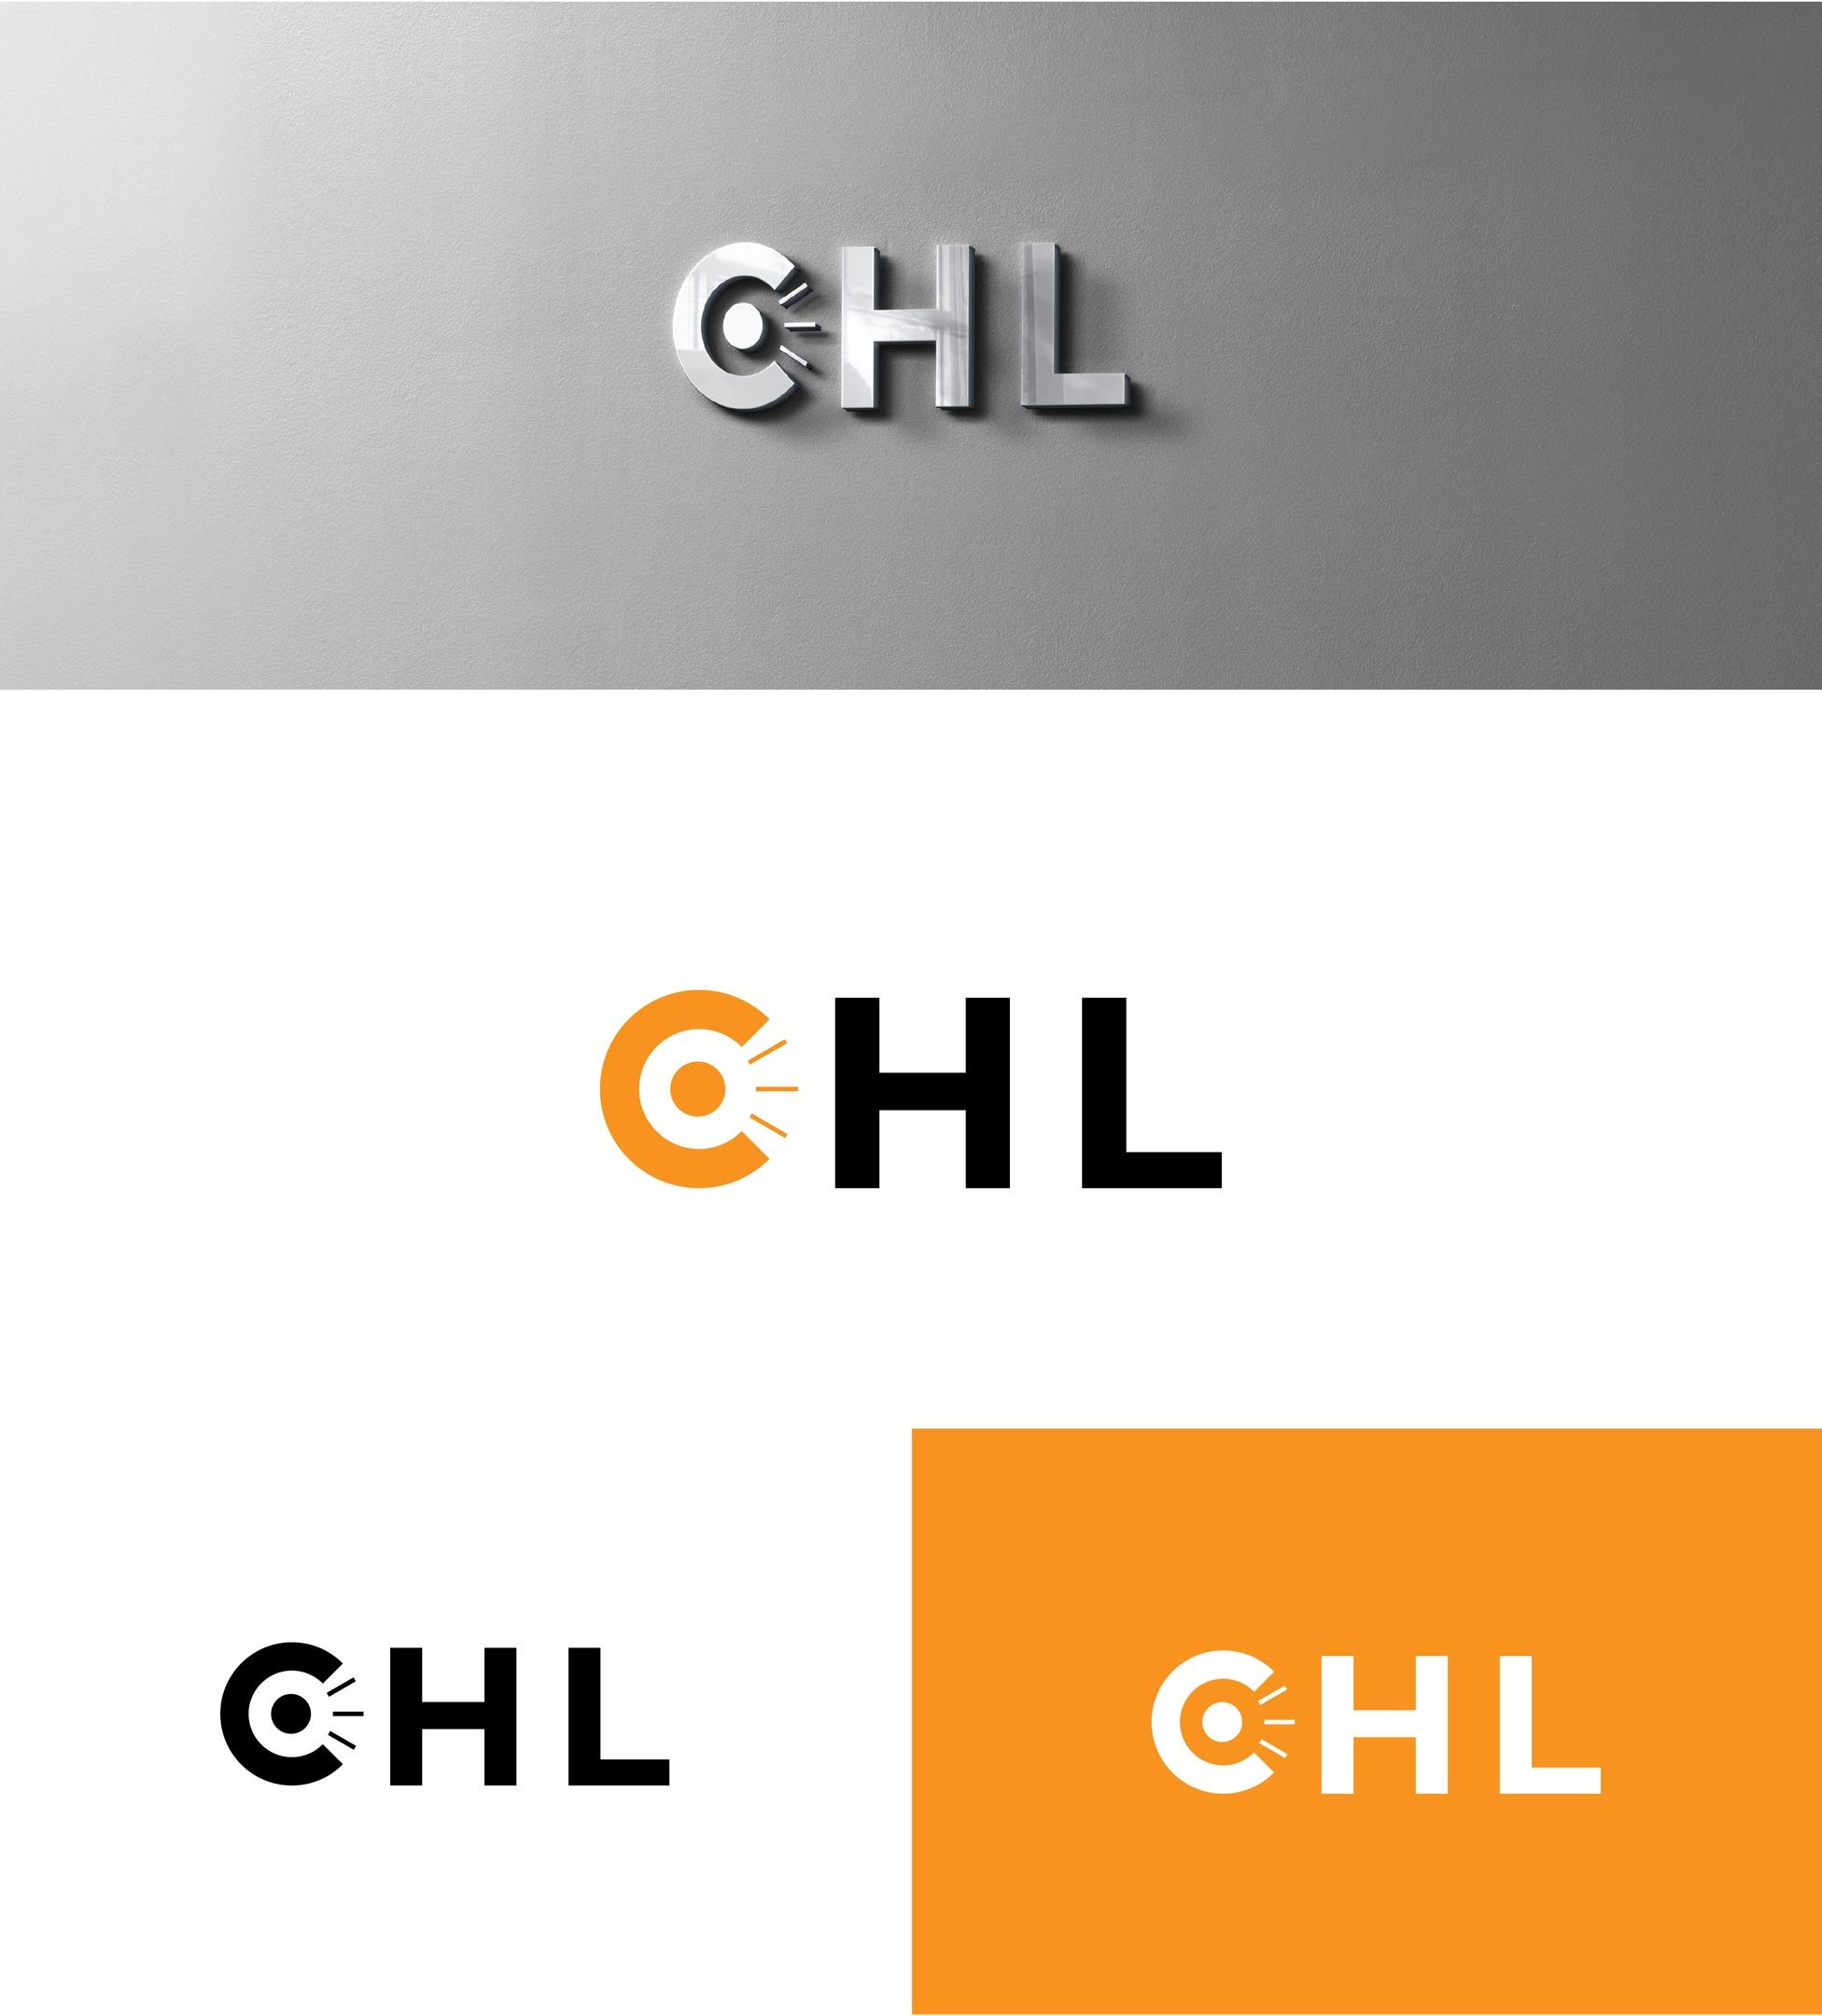 разработка логотипа для производителя фар фото f_3225f5cb1a16805a.jpg